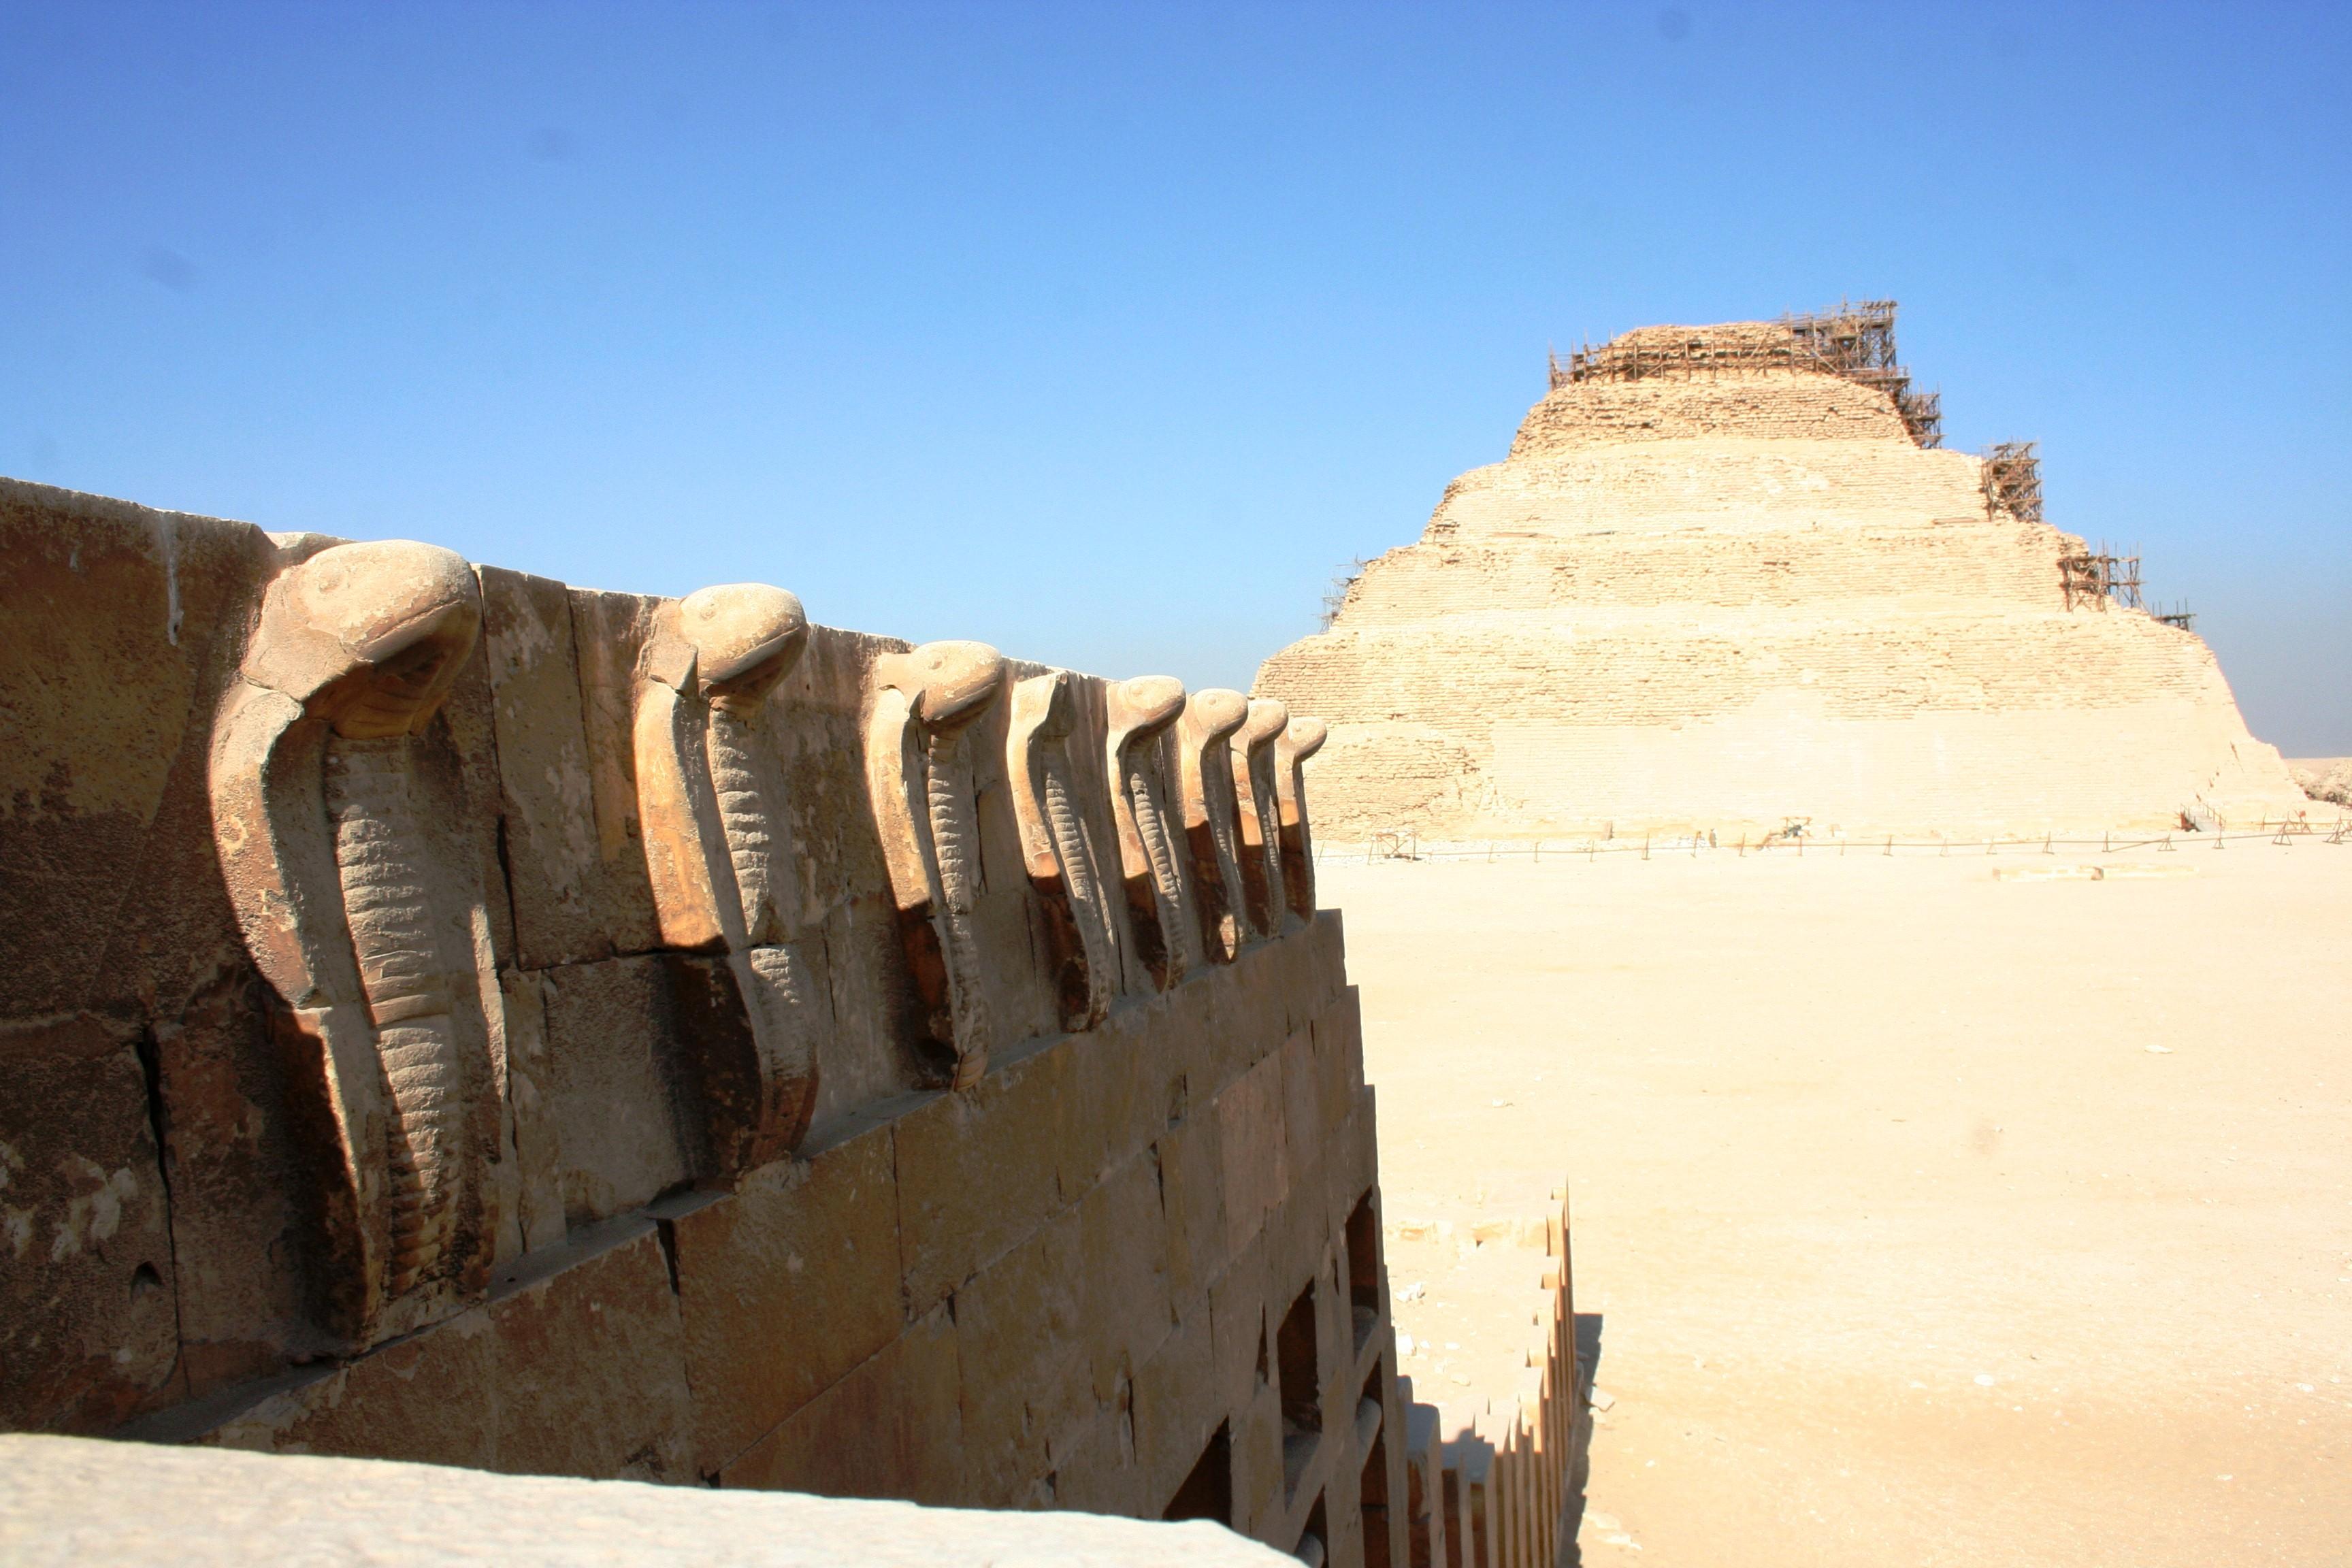 Cobras & Saqqara